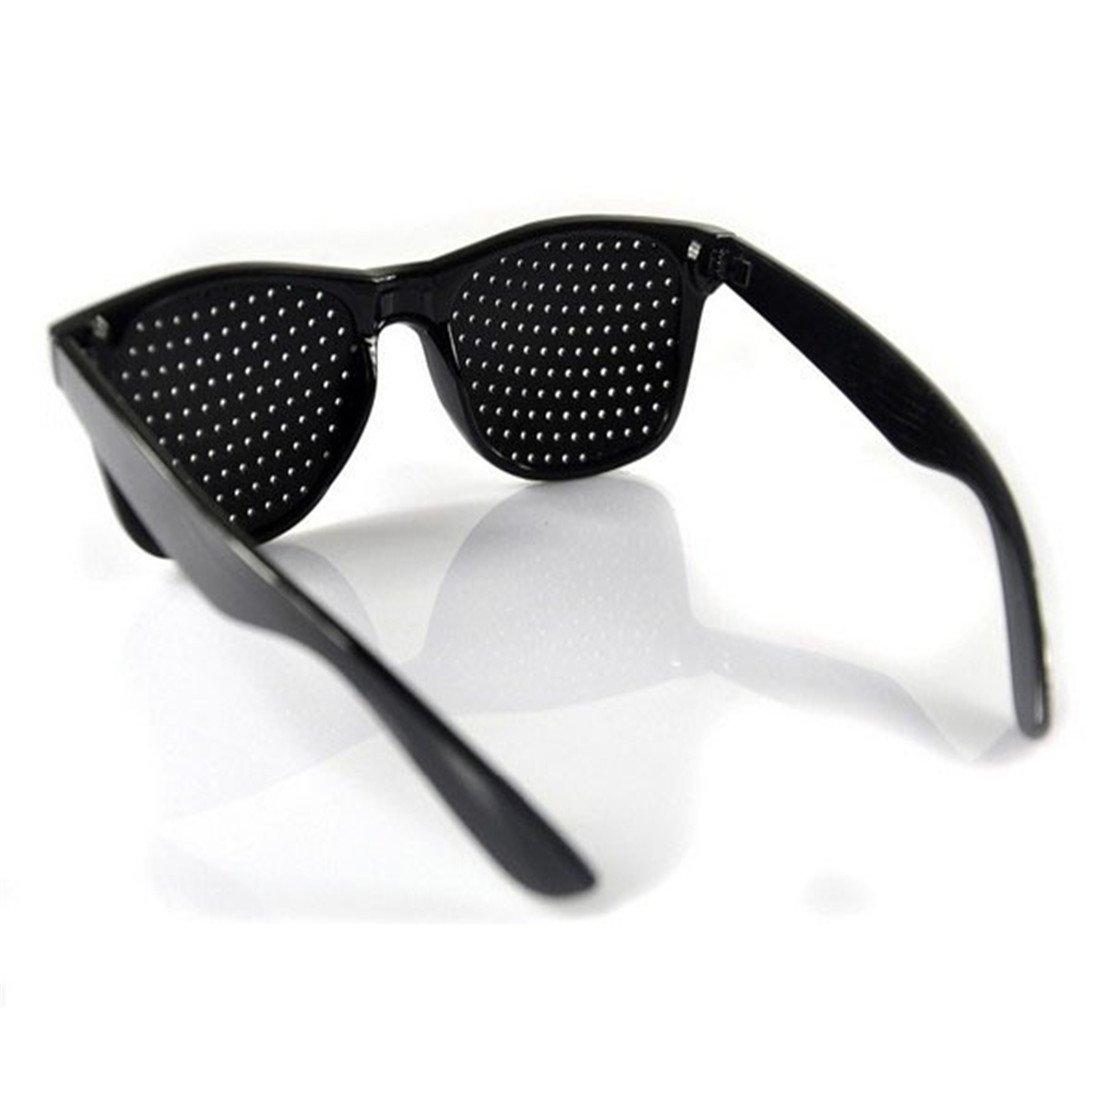 b57dbf8a4c Vision Care Pin Hole Sunglasses